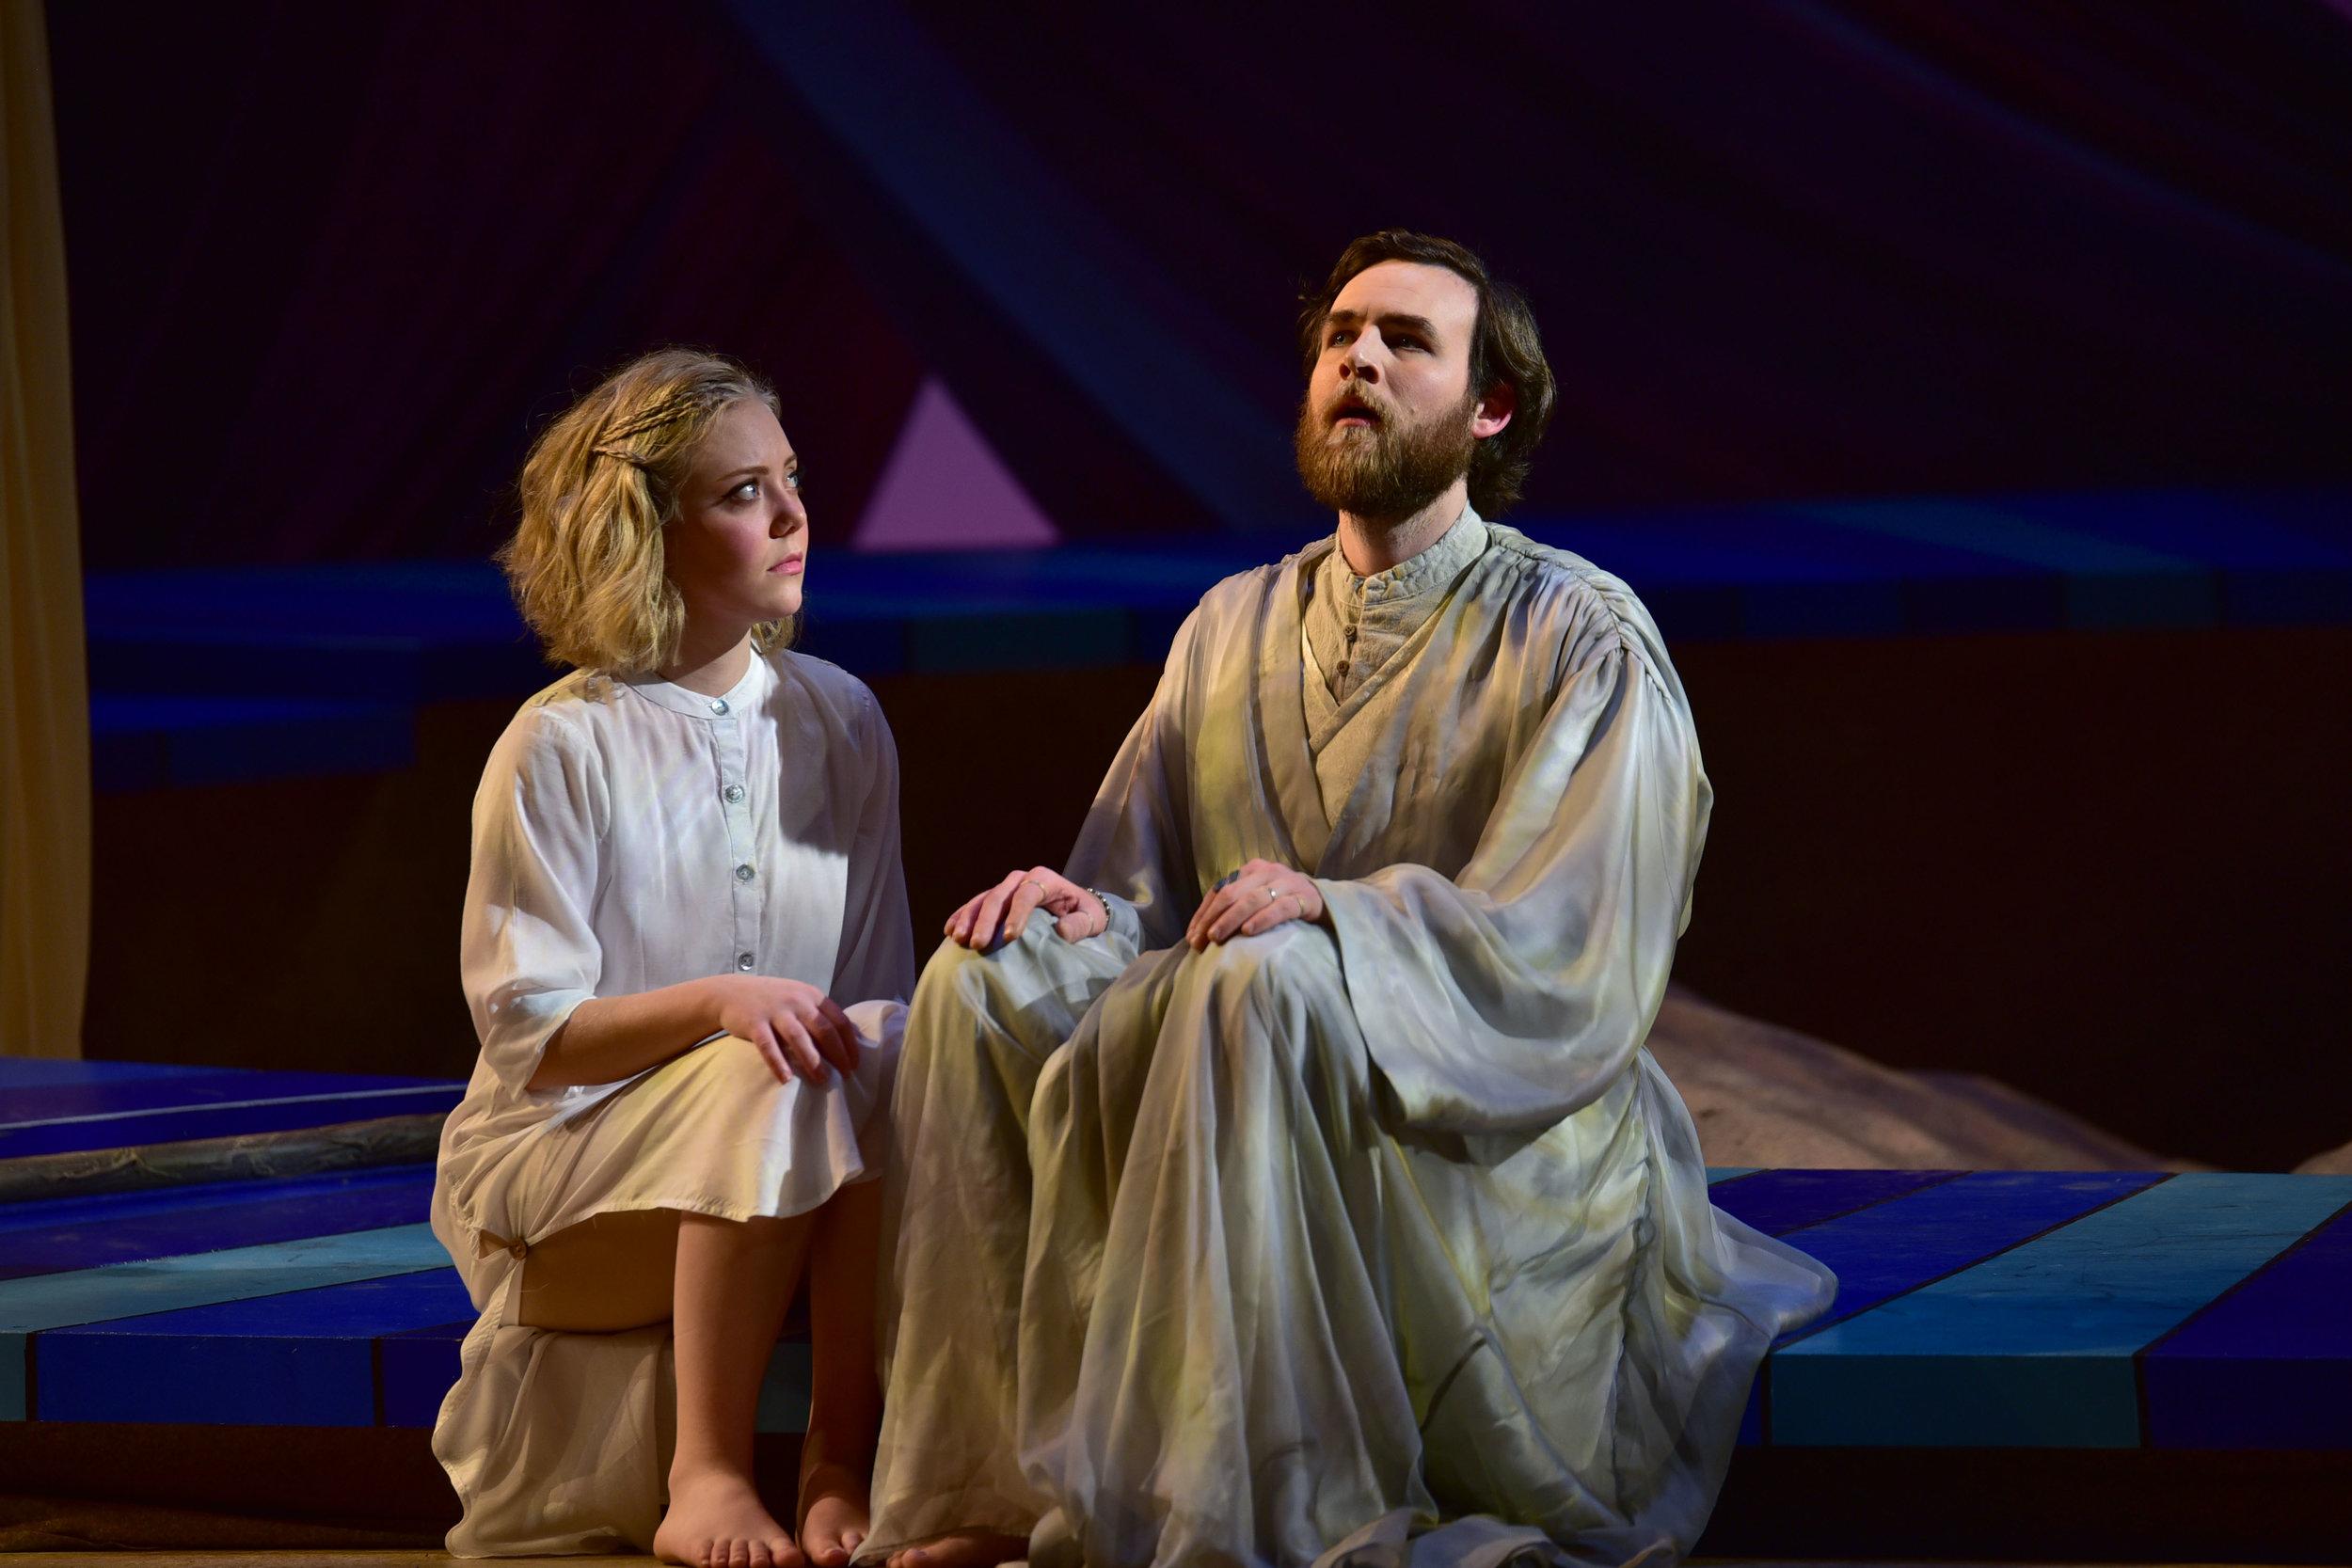 Matthew Murry as Prospero and Erin Logan as Miranda.